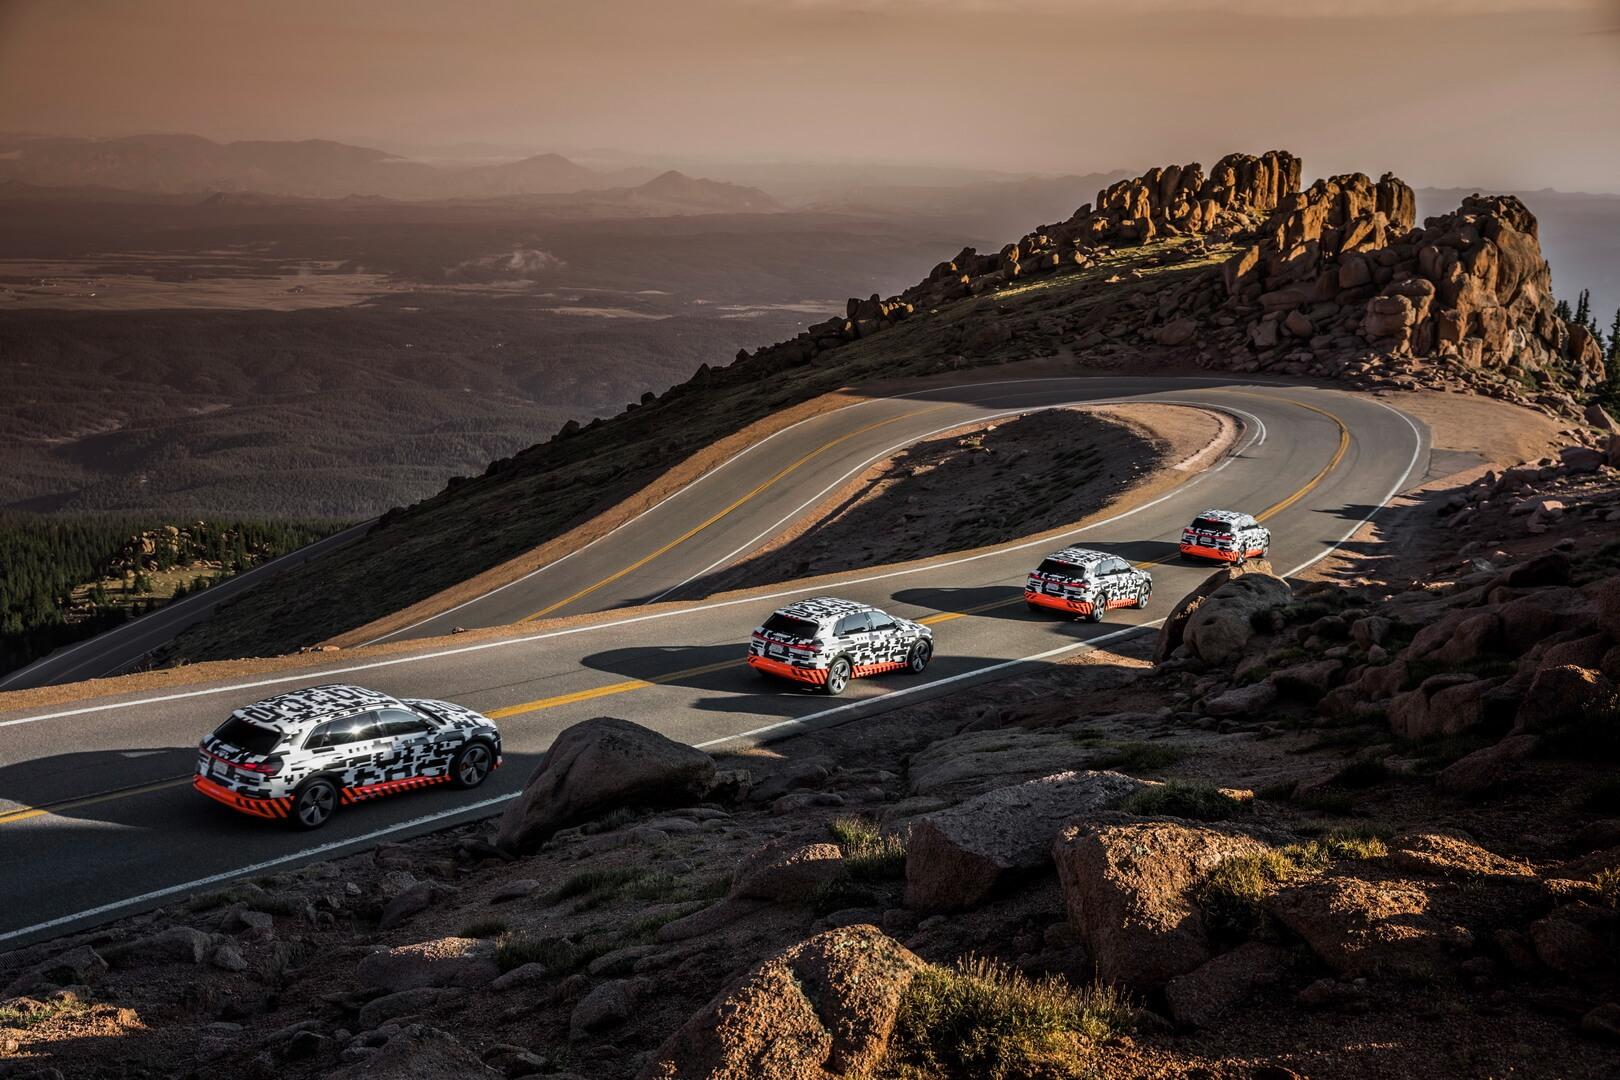 Электромобили Audi e-tron quattro подымаются навершину Pikes Peak